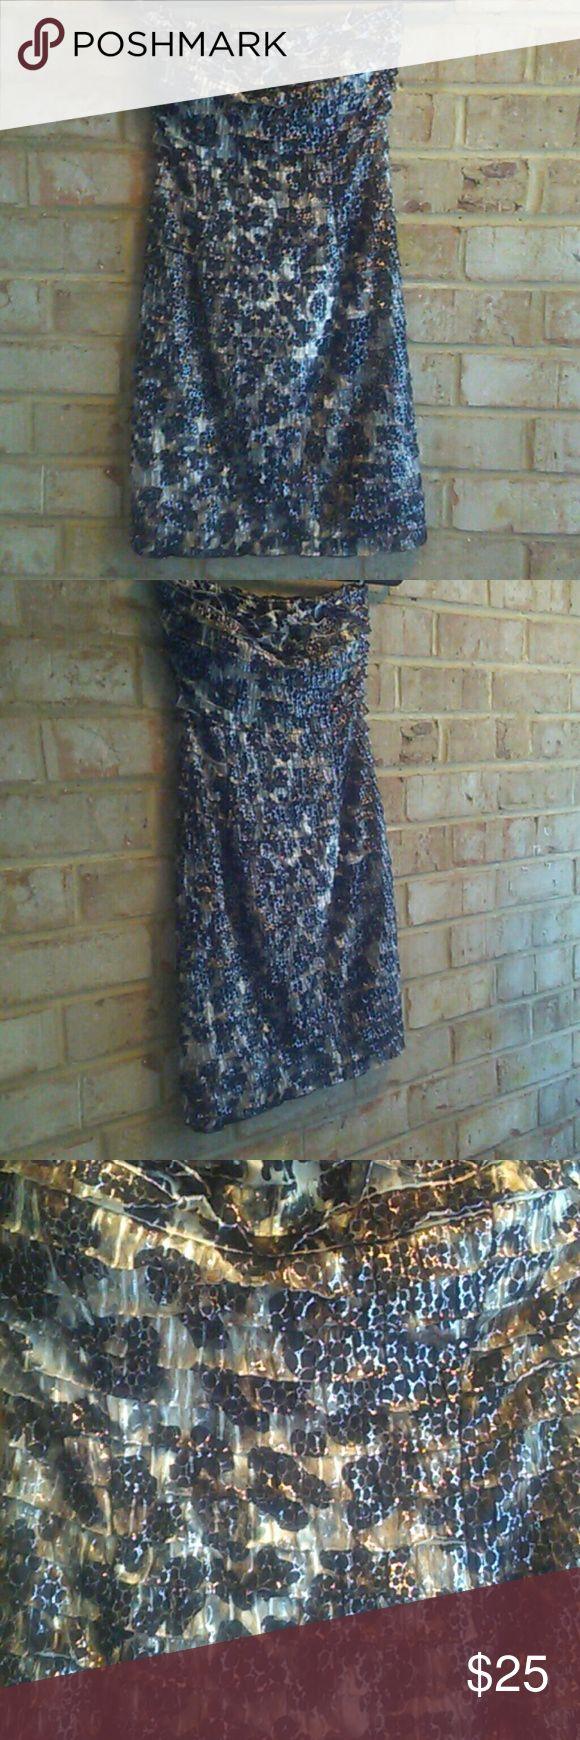 Selling this LOVELY DRESS on Poshmark! My username is: mztyrema. #shopmycloset #poshmark #fashion #shopping #style #forsale #LOVELY DAY #Dresses & Skirts